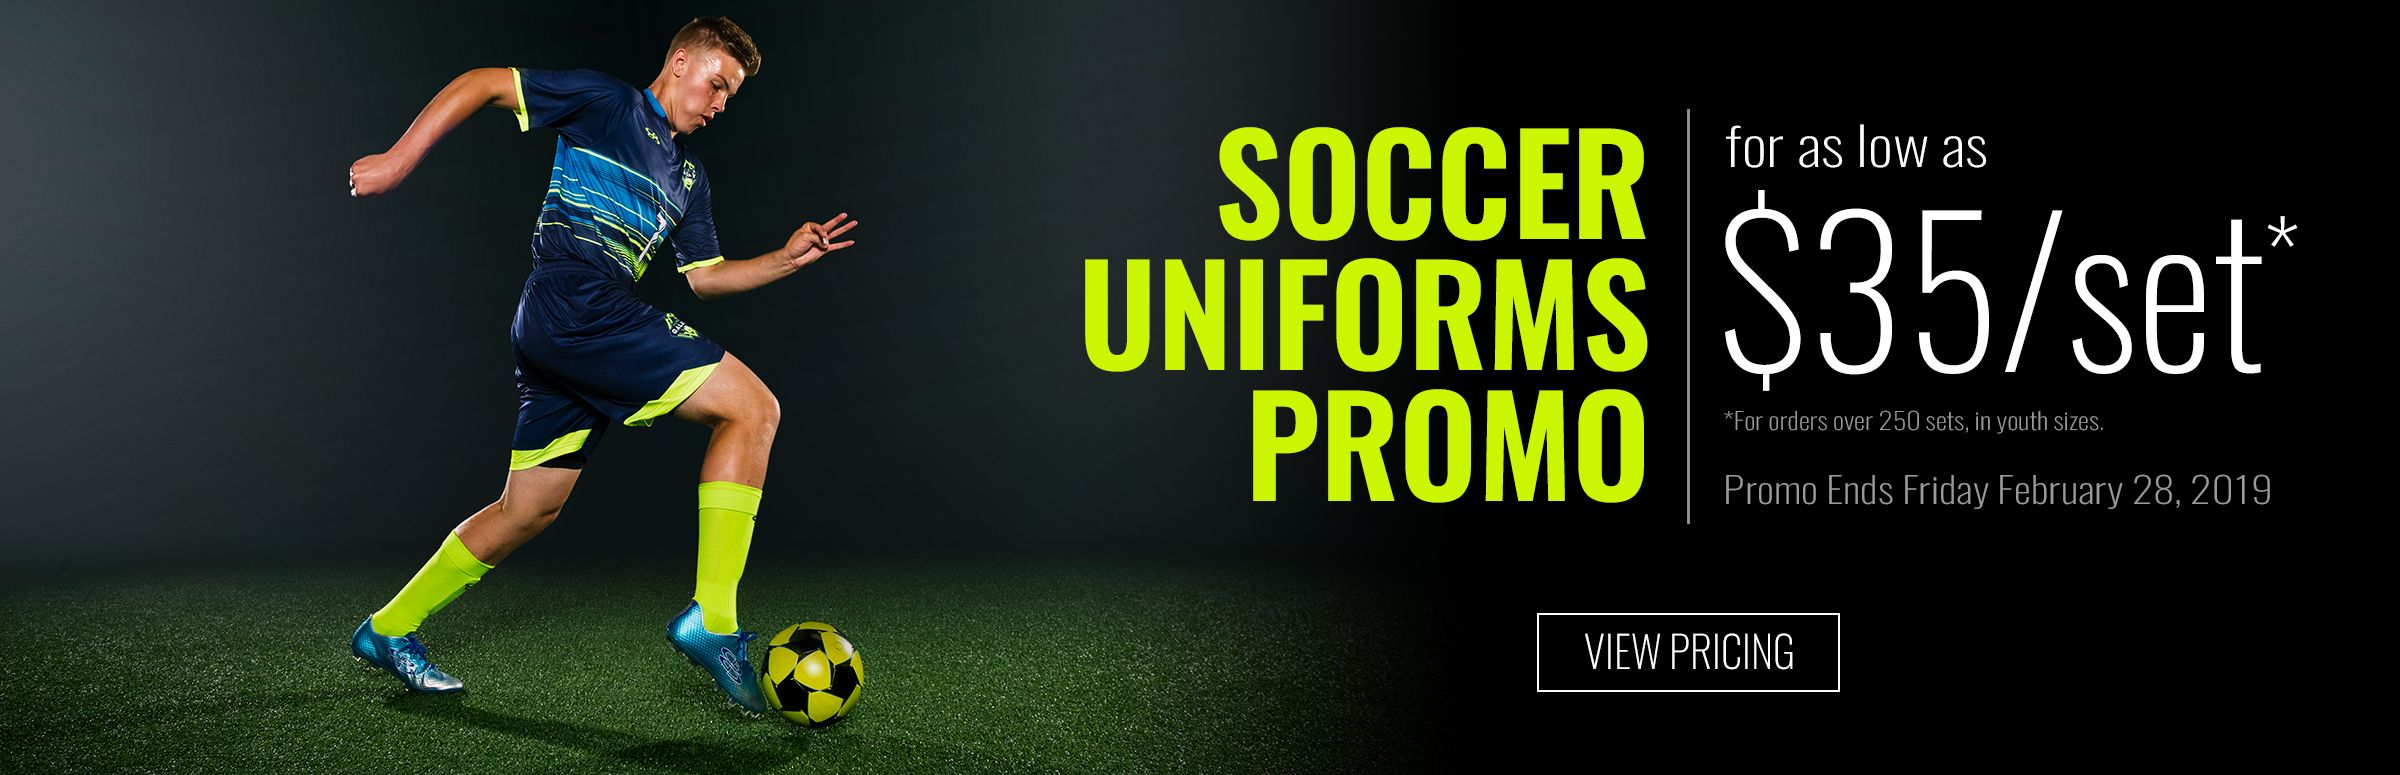 Soccer Uniform Promos